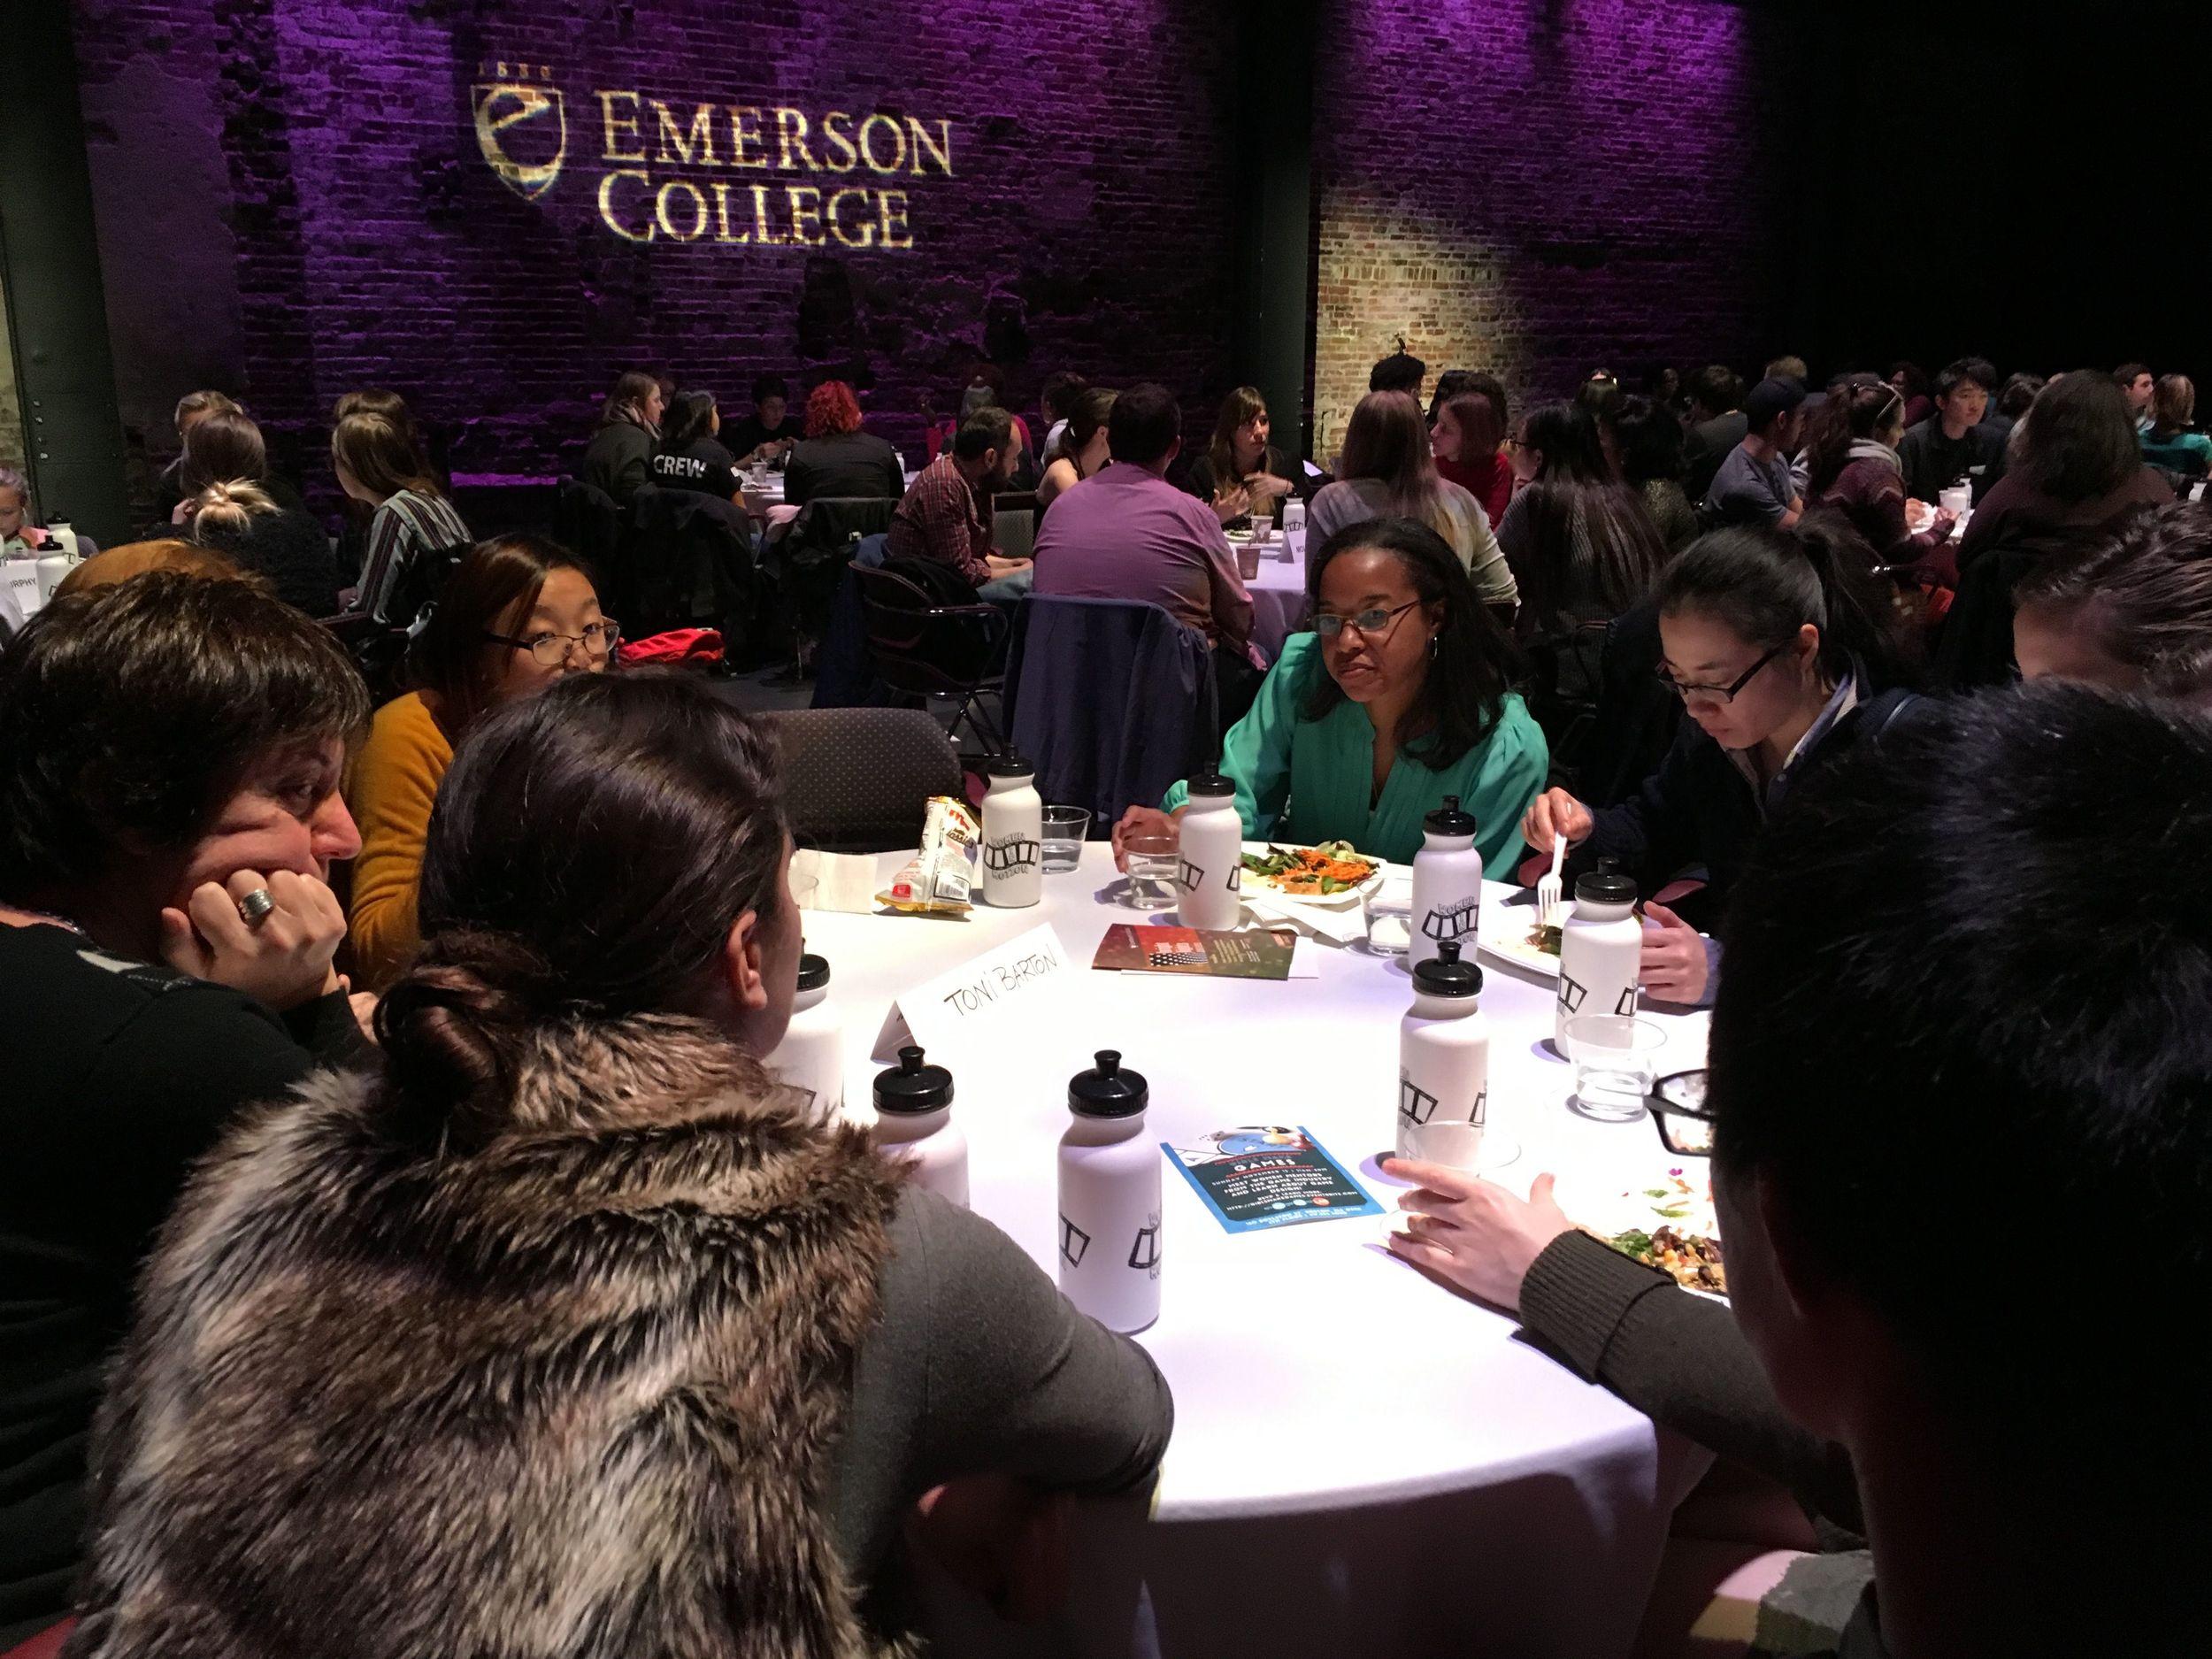 Art Director/Production Designer Toni Barton with Emerson College students.